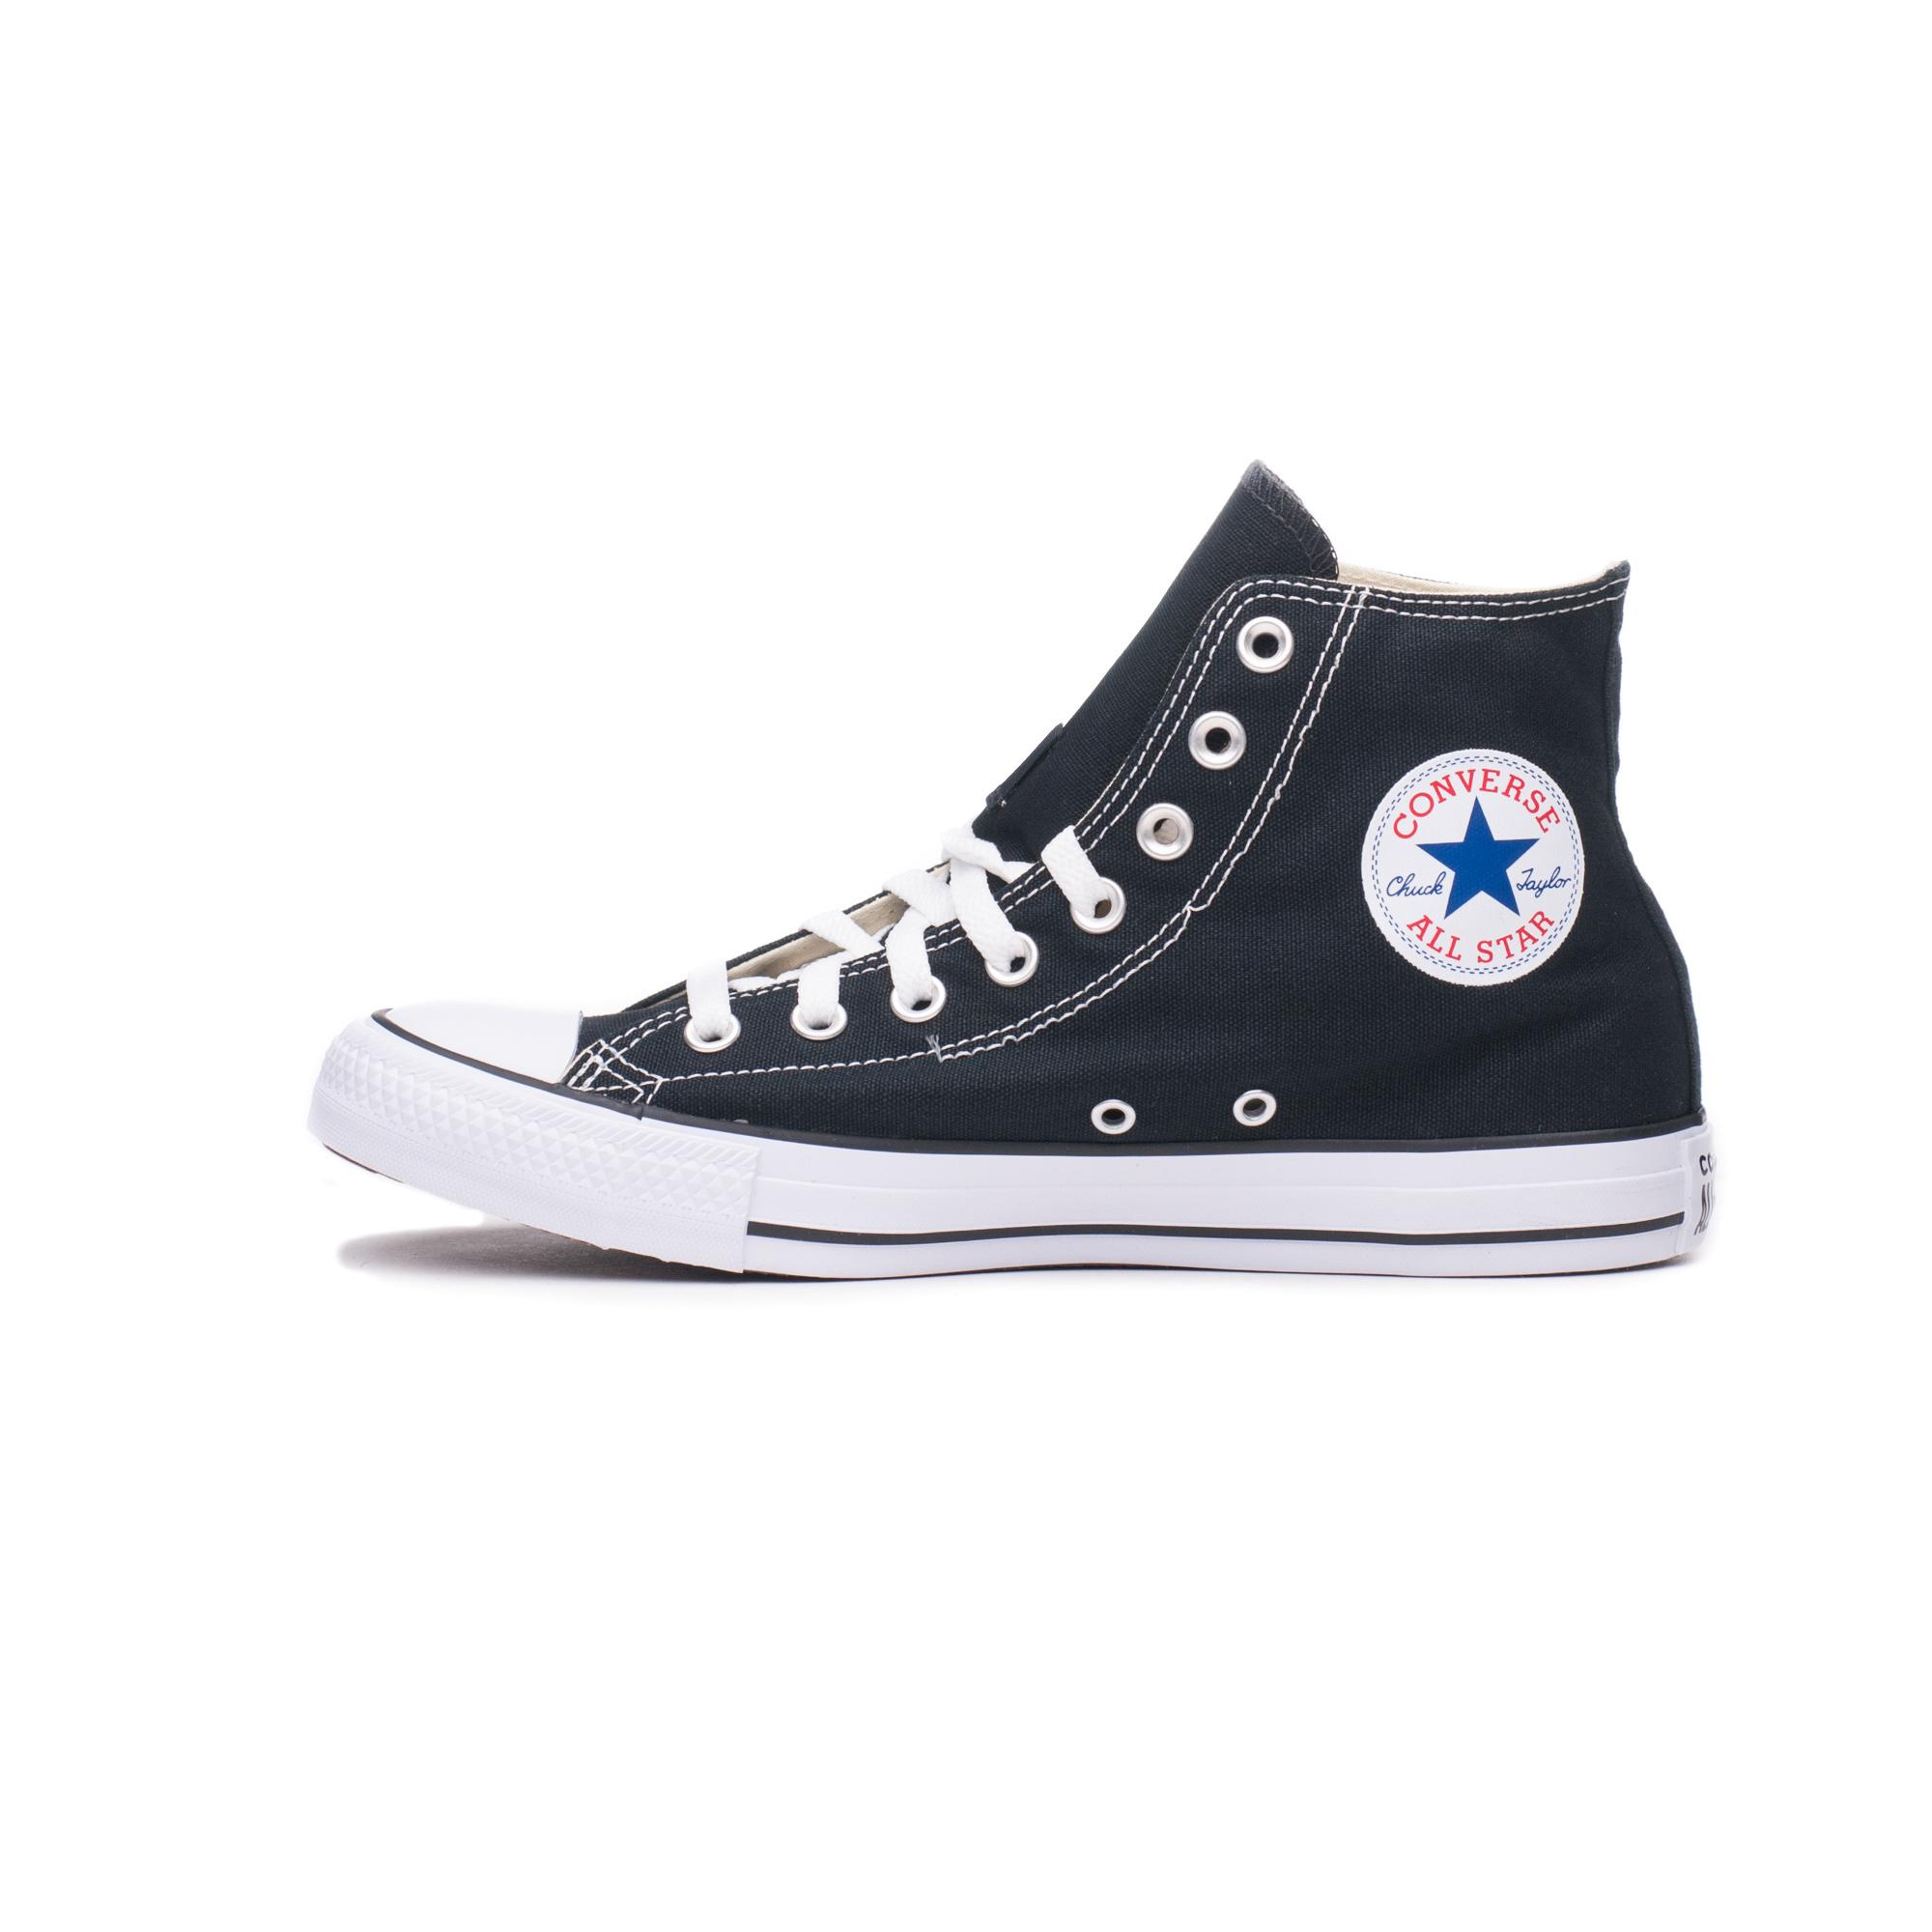 Кеди високі унісекс Converse CHUCK TAYLOR ALL STAR